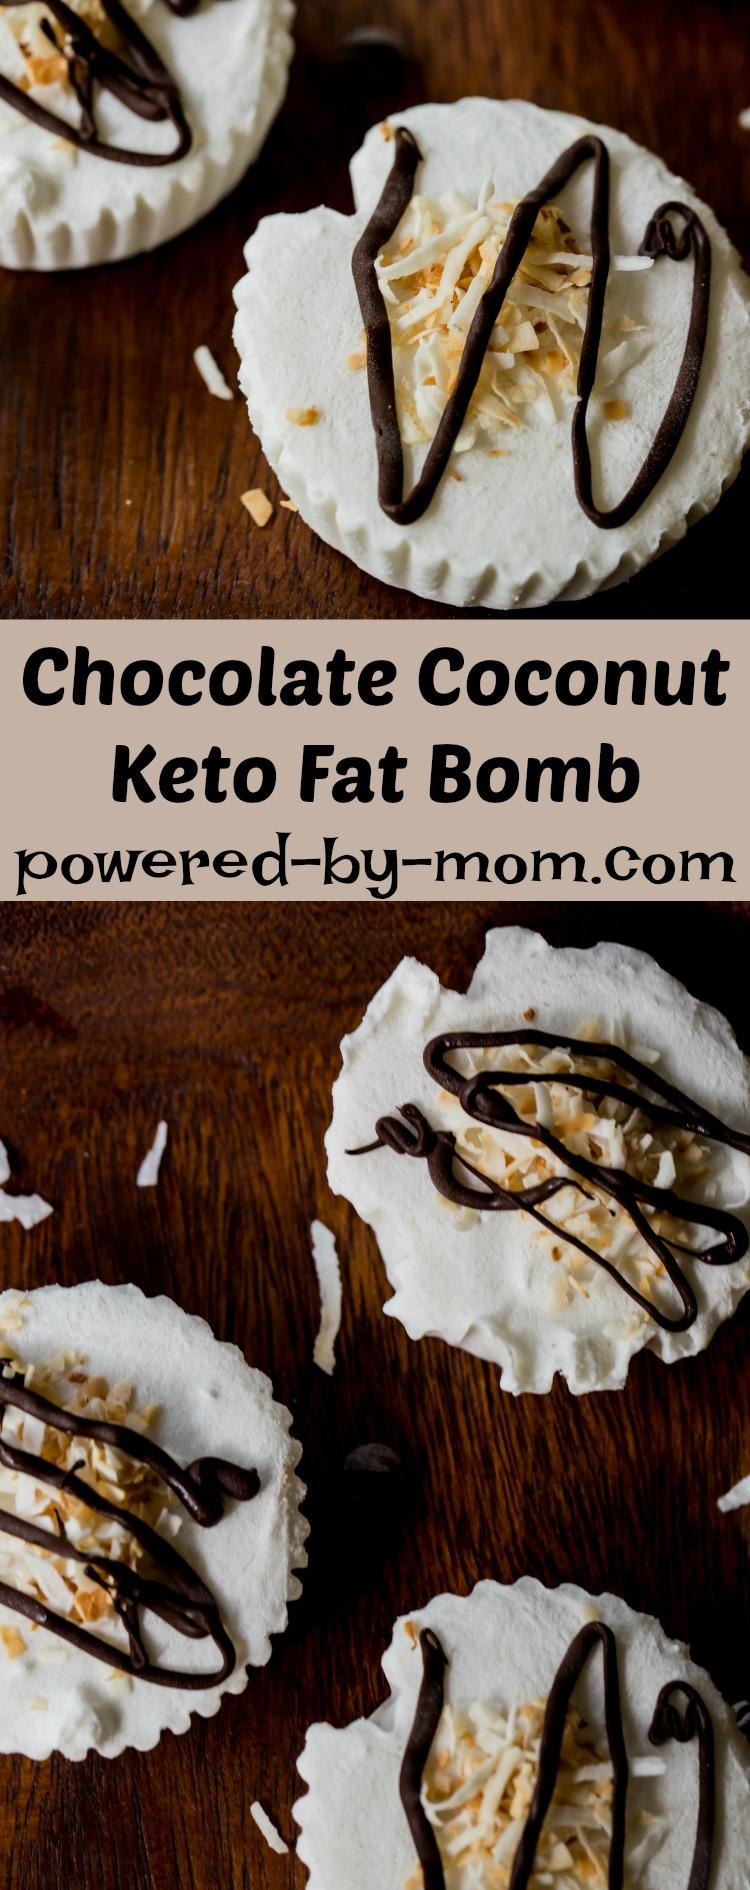 chocolate coconut keto fat bomb